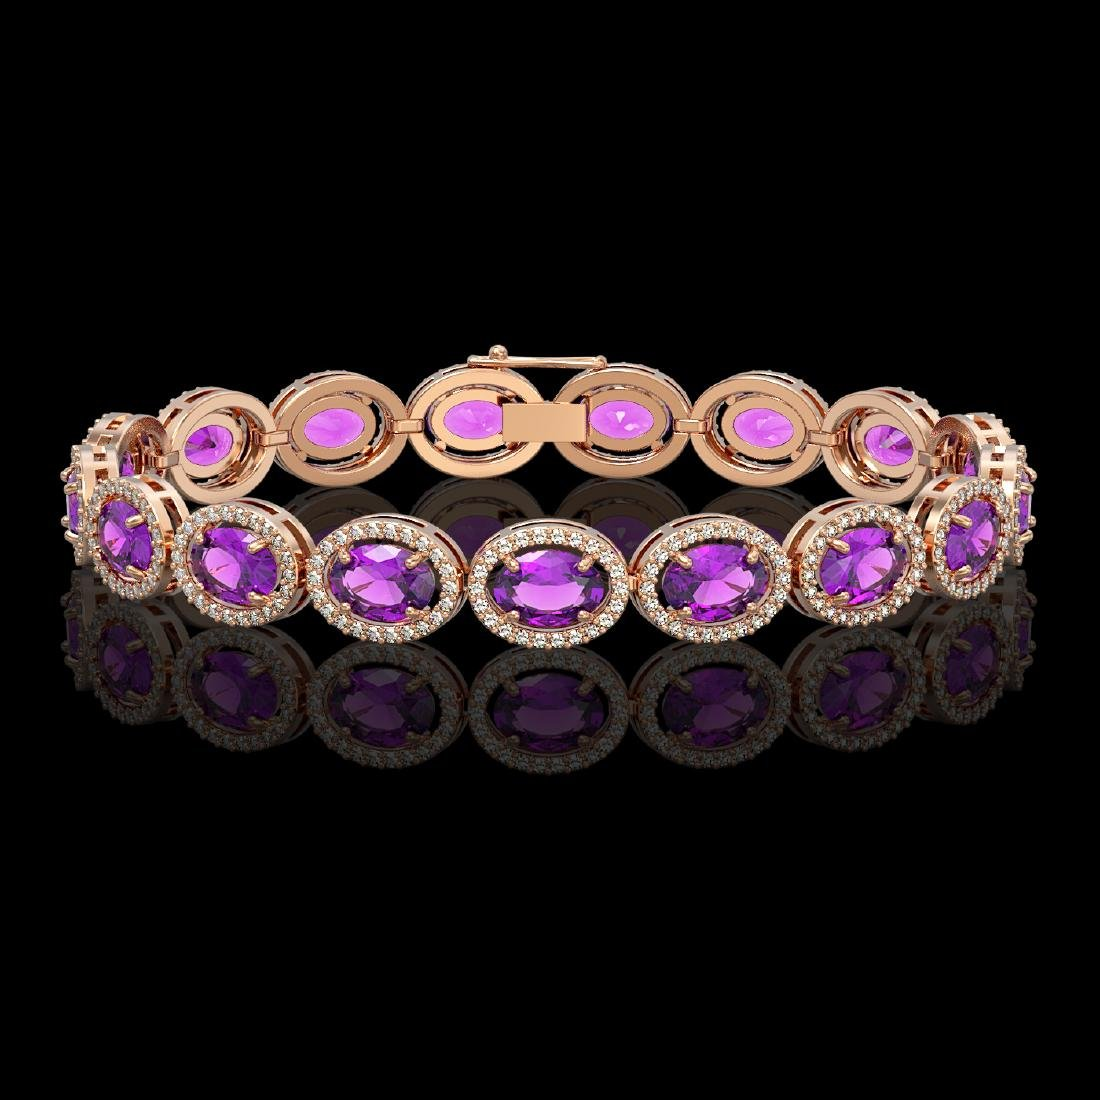 19.82 CTW Amethyst & Diamond Halo Bracelet 10K Rose